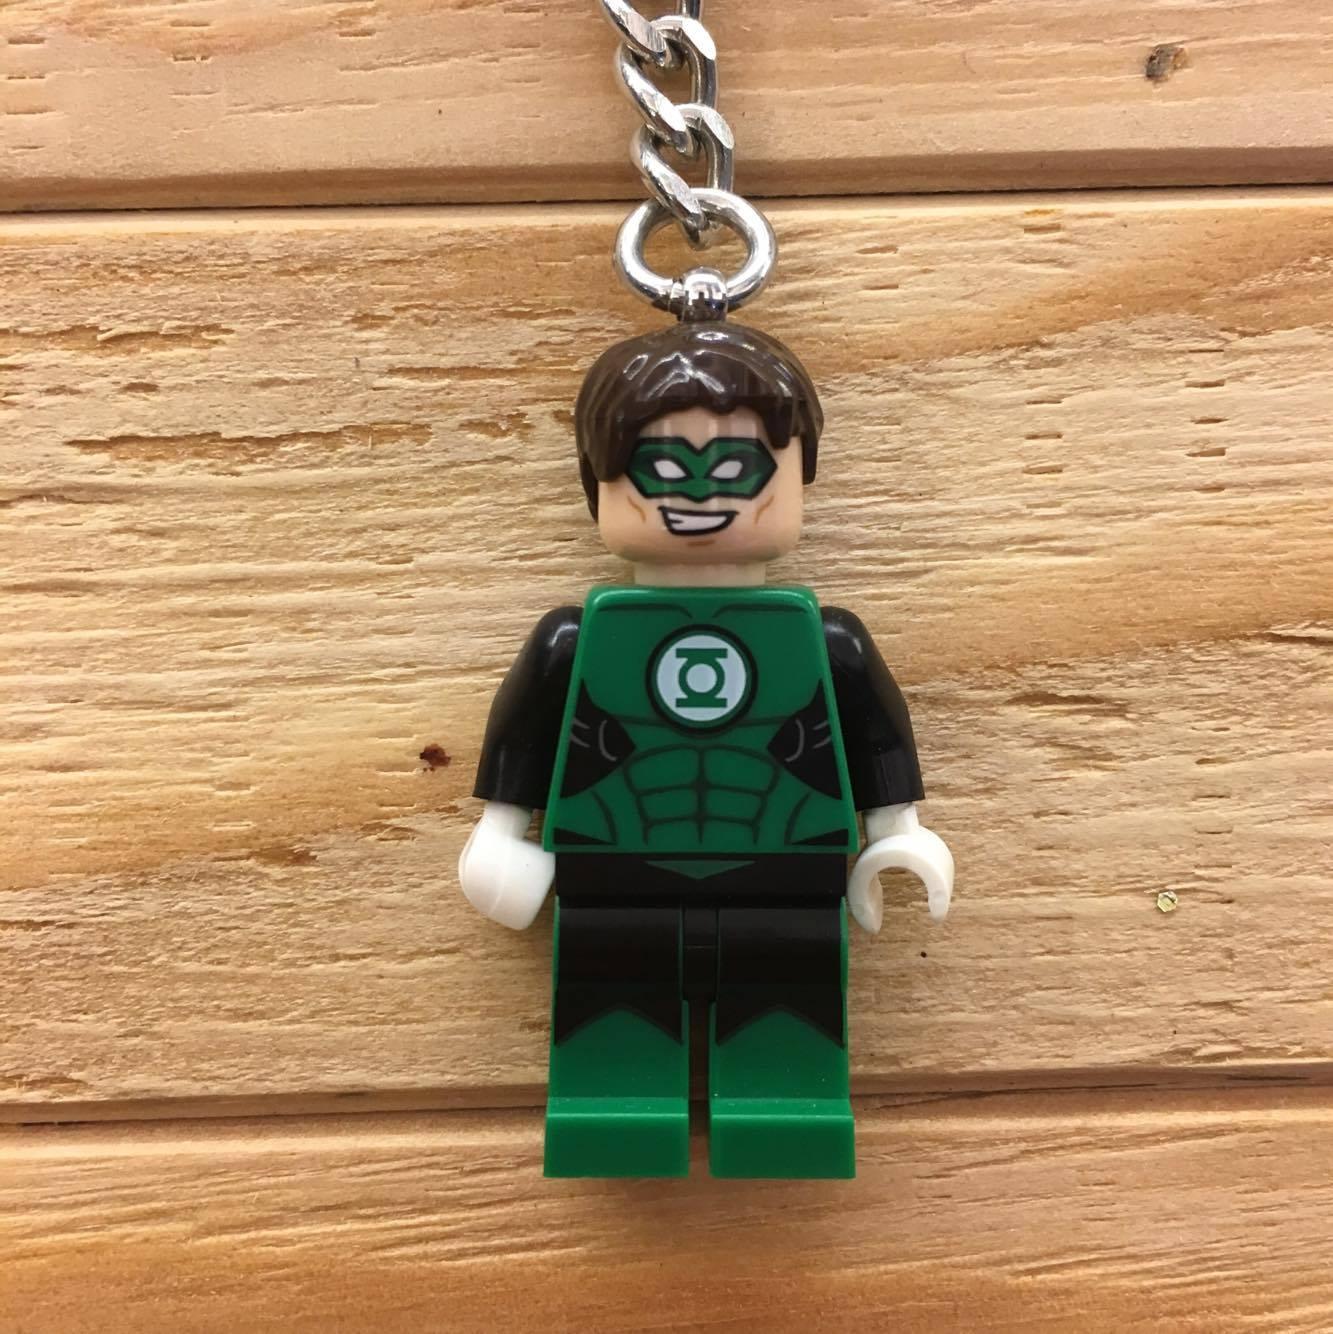 BEETLE LEGO SUPER HEROES GREEN LANTERN 綠燈俠 樂高 積木 鑰匙圈 玩具 1